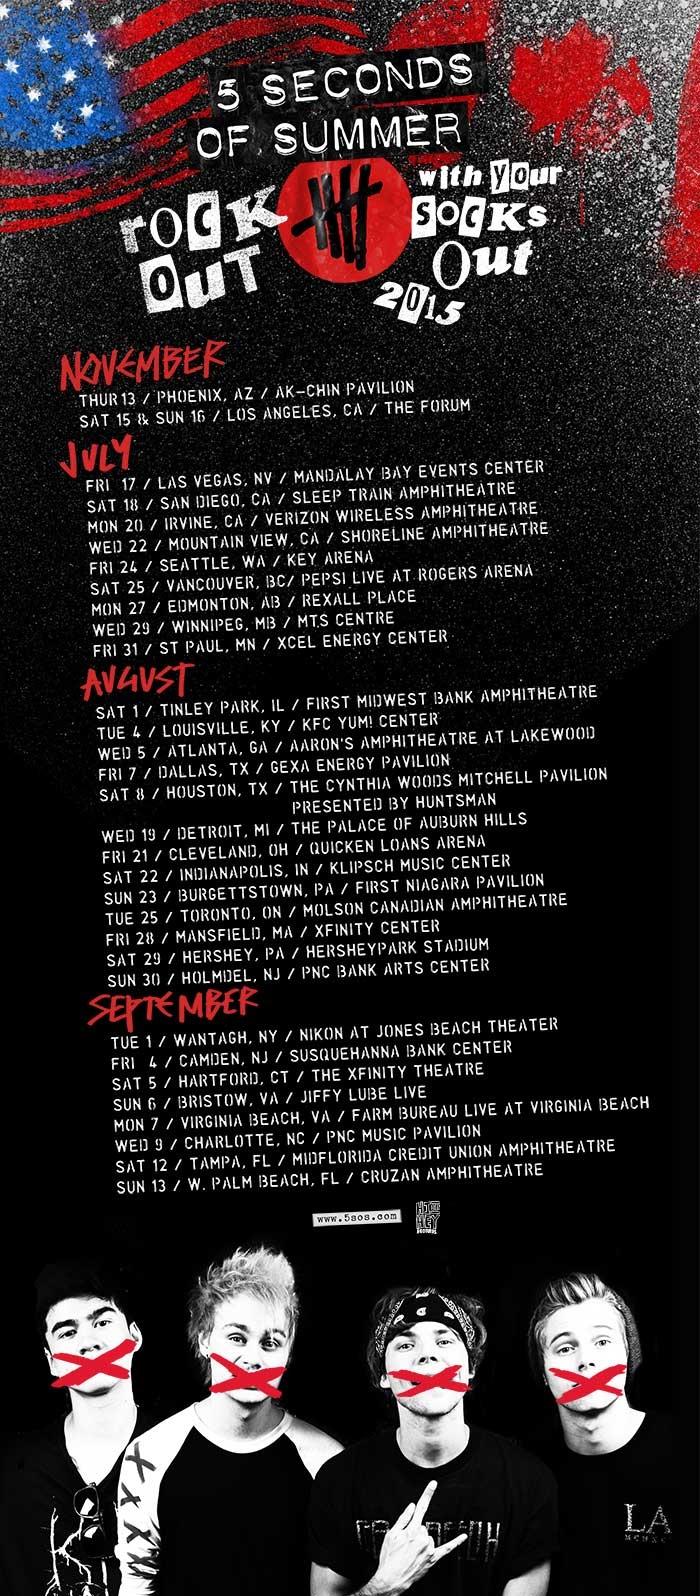 Train tour dates